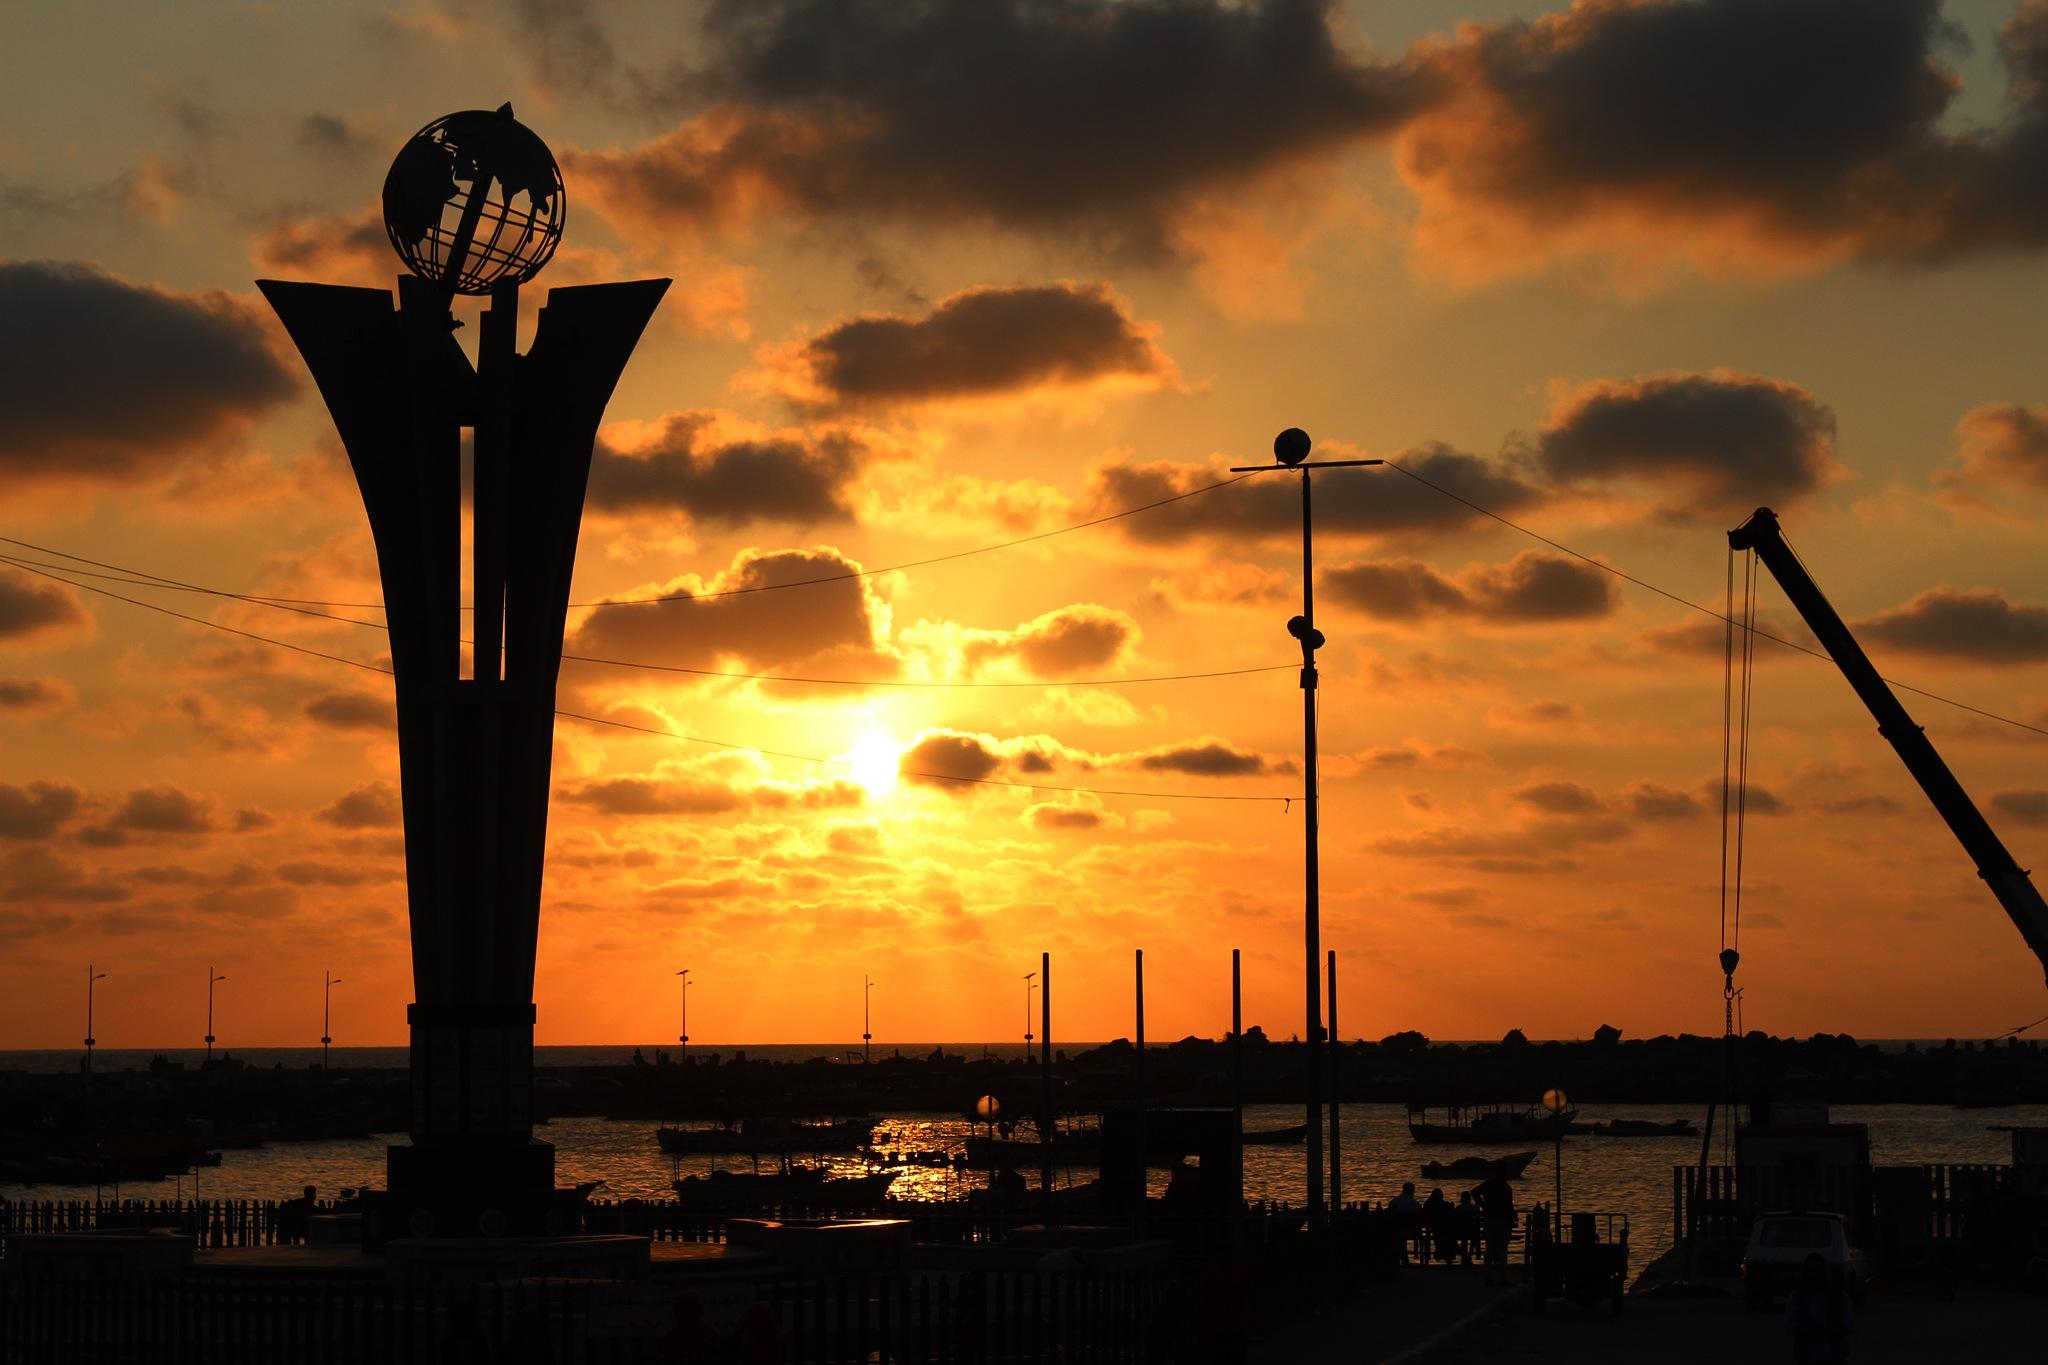 Gaza Port - Palestine by Weam M. Kwaik